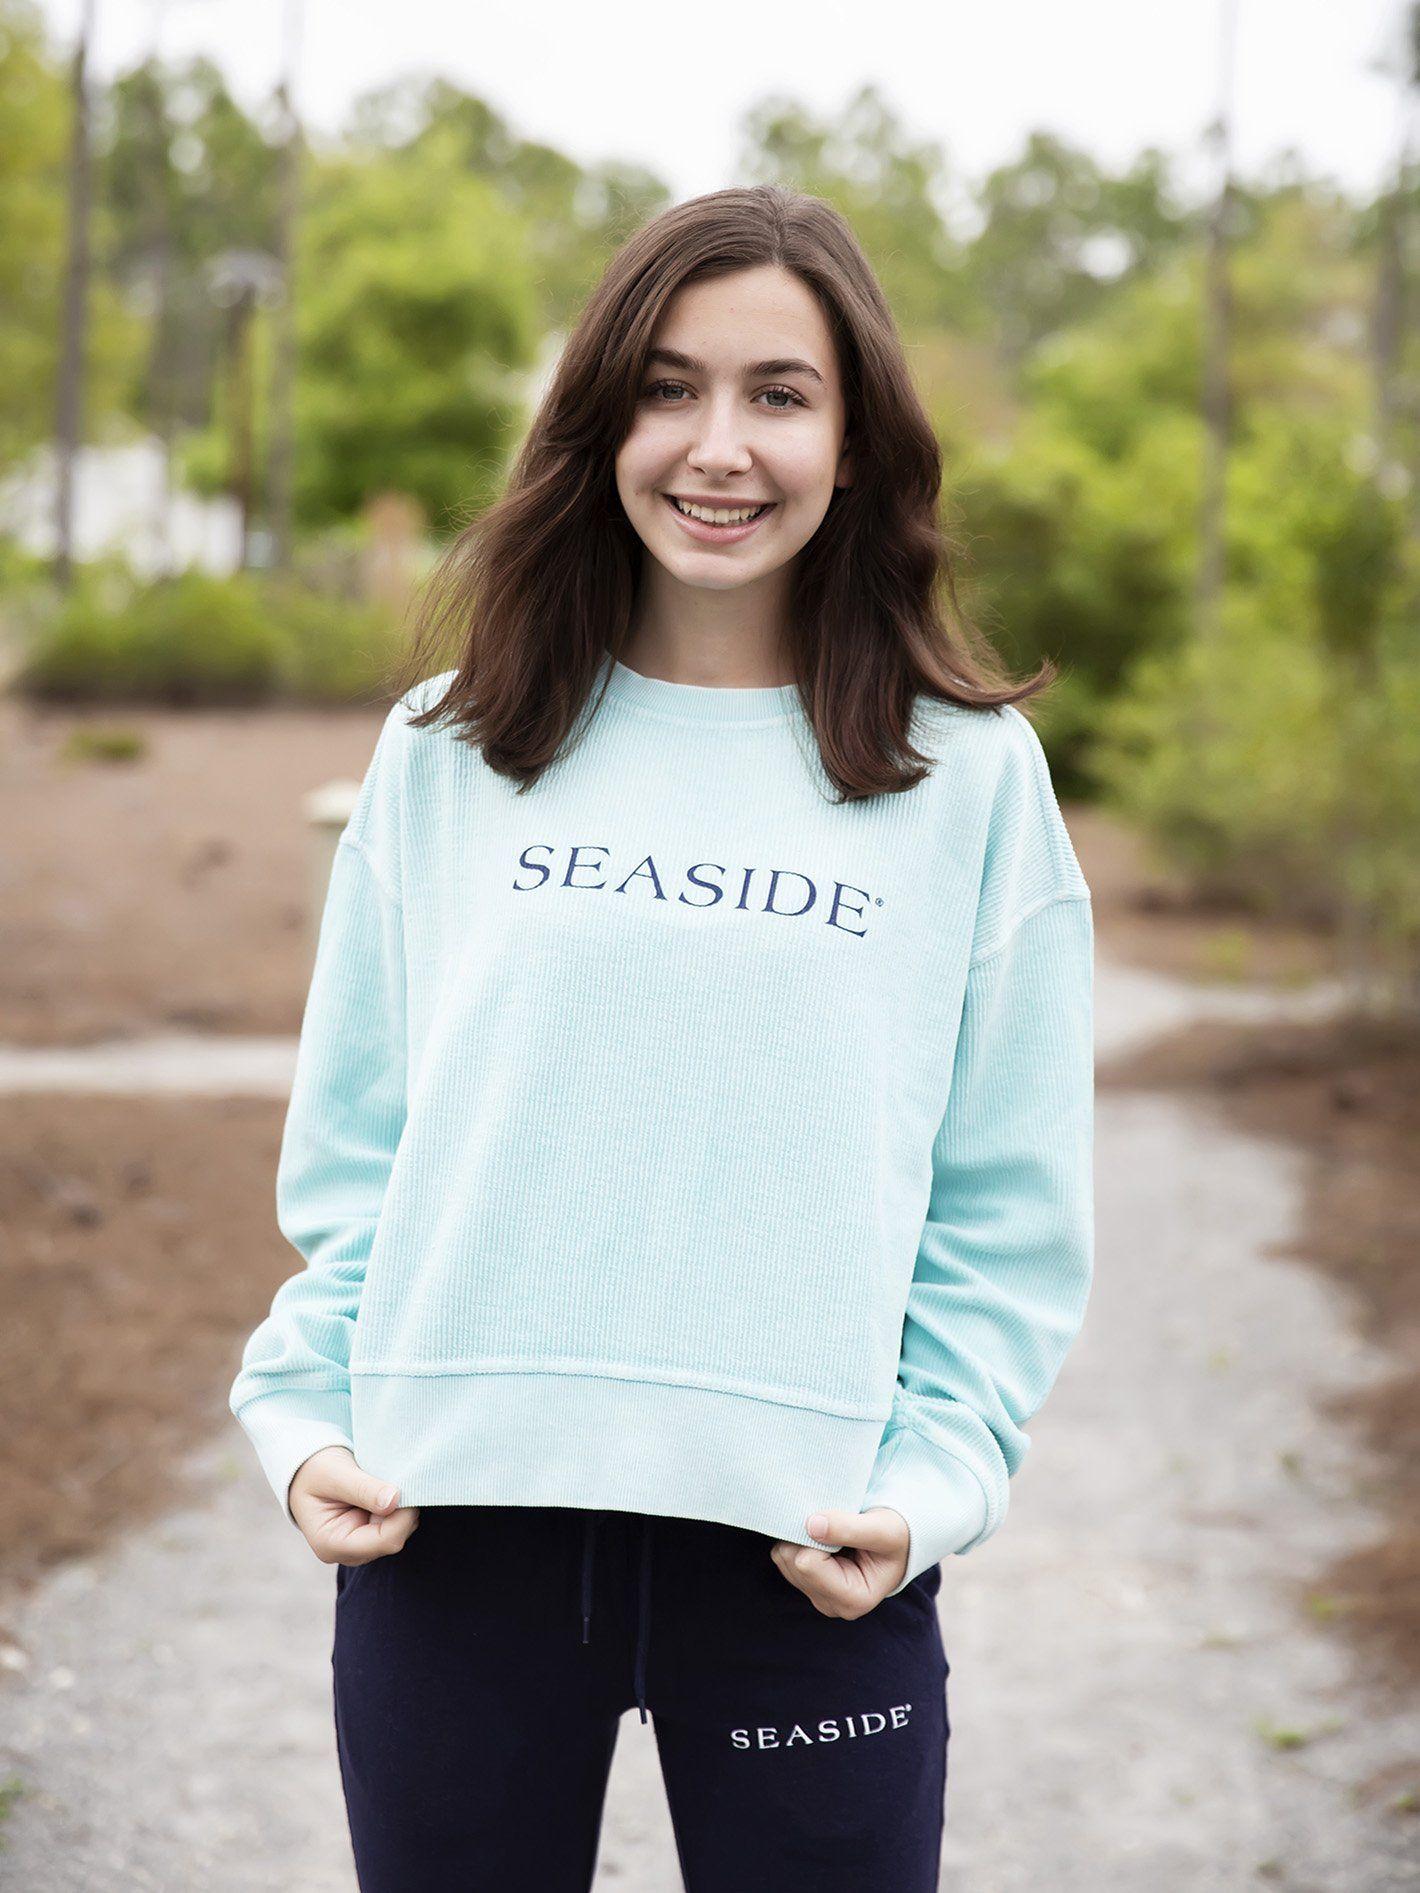 Mint Cropped Ribbed Seaside Sweatshirt In 2021 Seaside Sweatshirt Sweatshirts Cropped Crewneck [ 1893 x 1420 Pixel ]